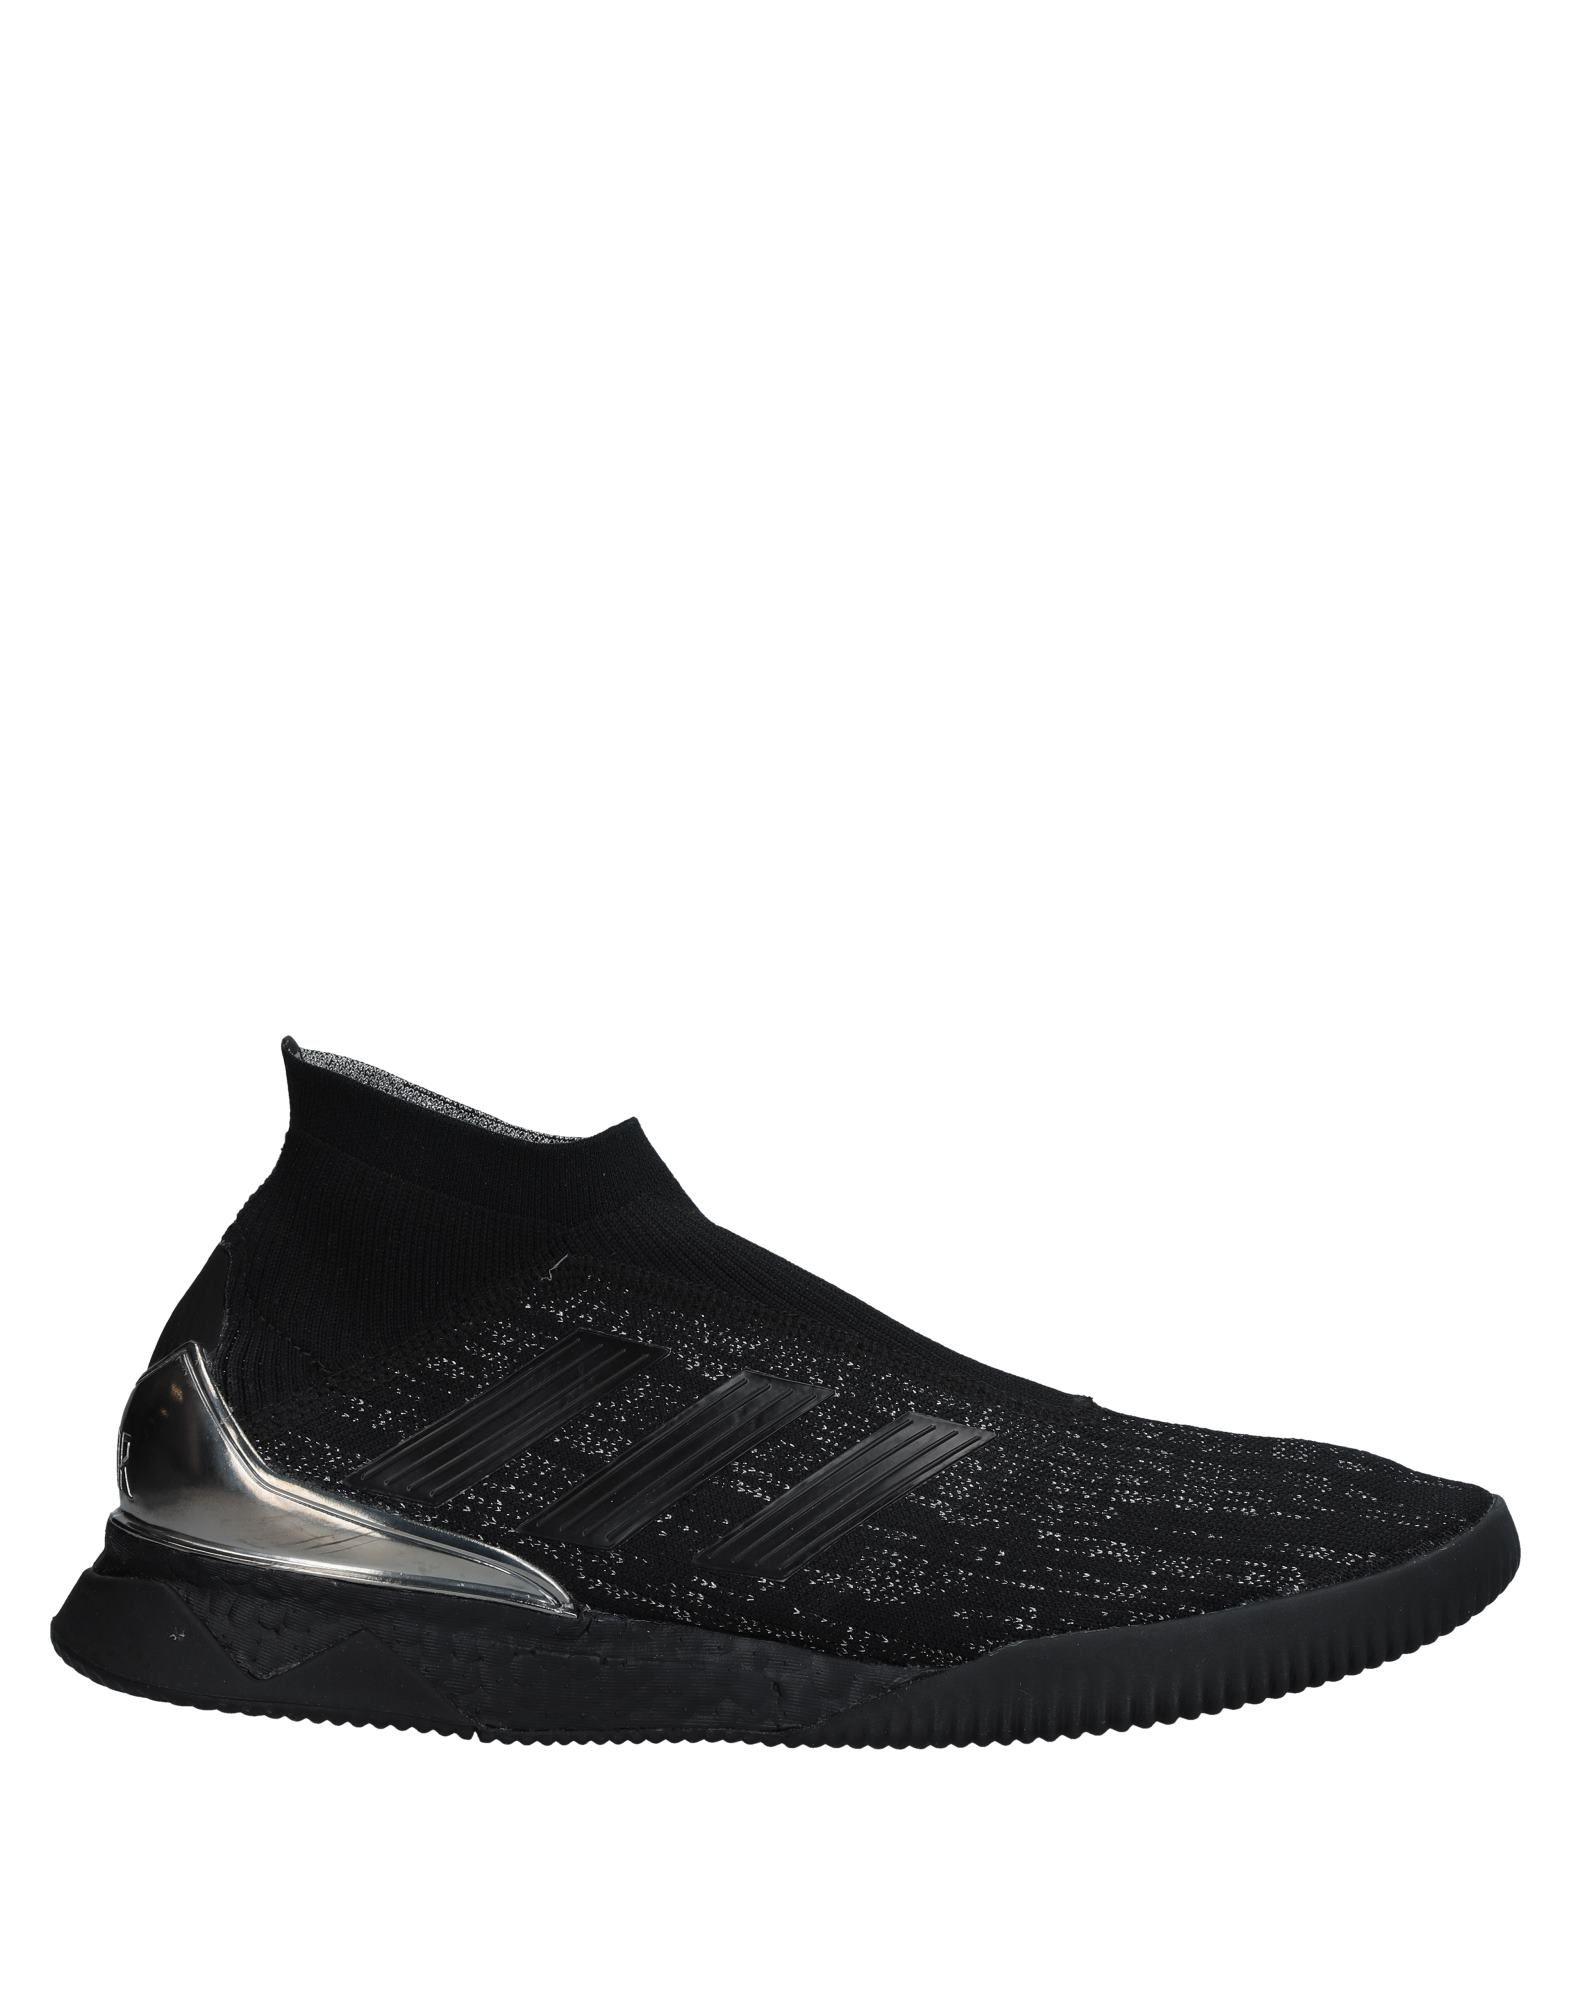 Haltbare Mode billige Schuhe Adidas Sneakers Herren  11541961GU Heiße Schuhe